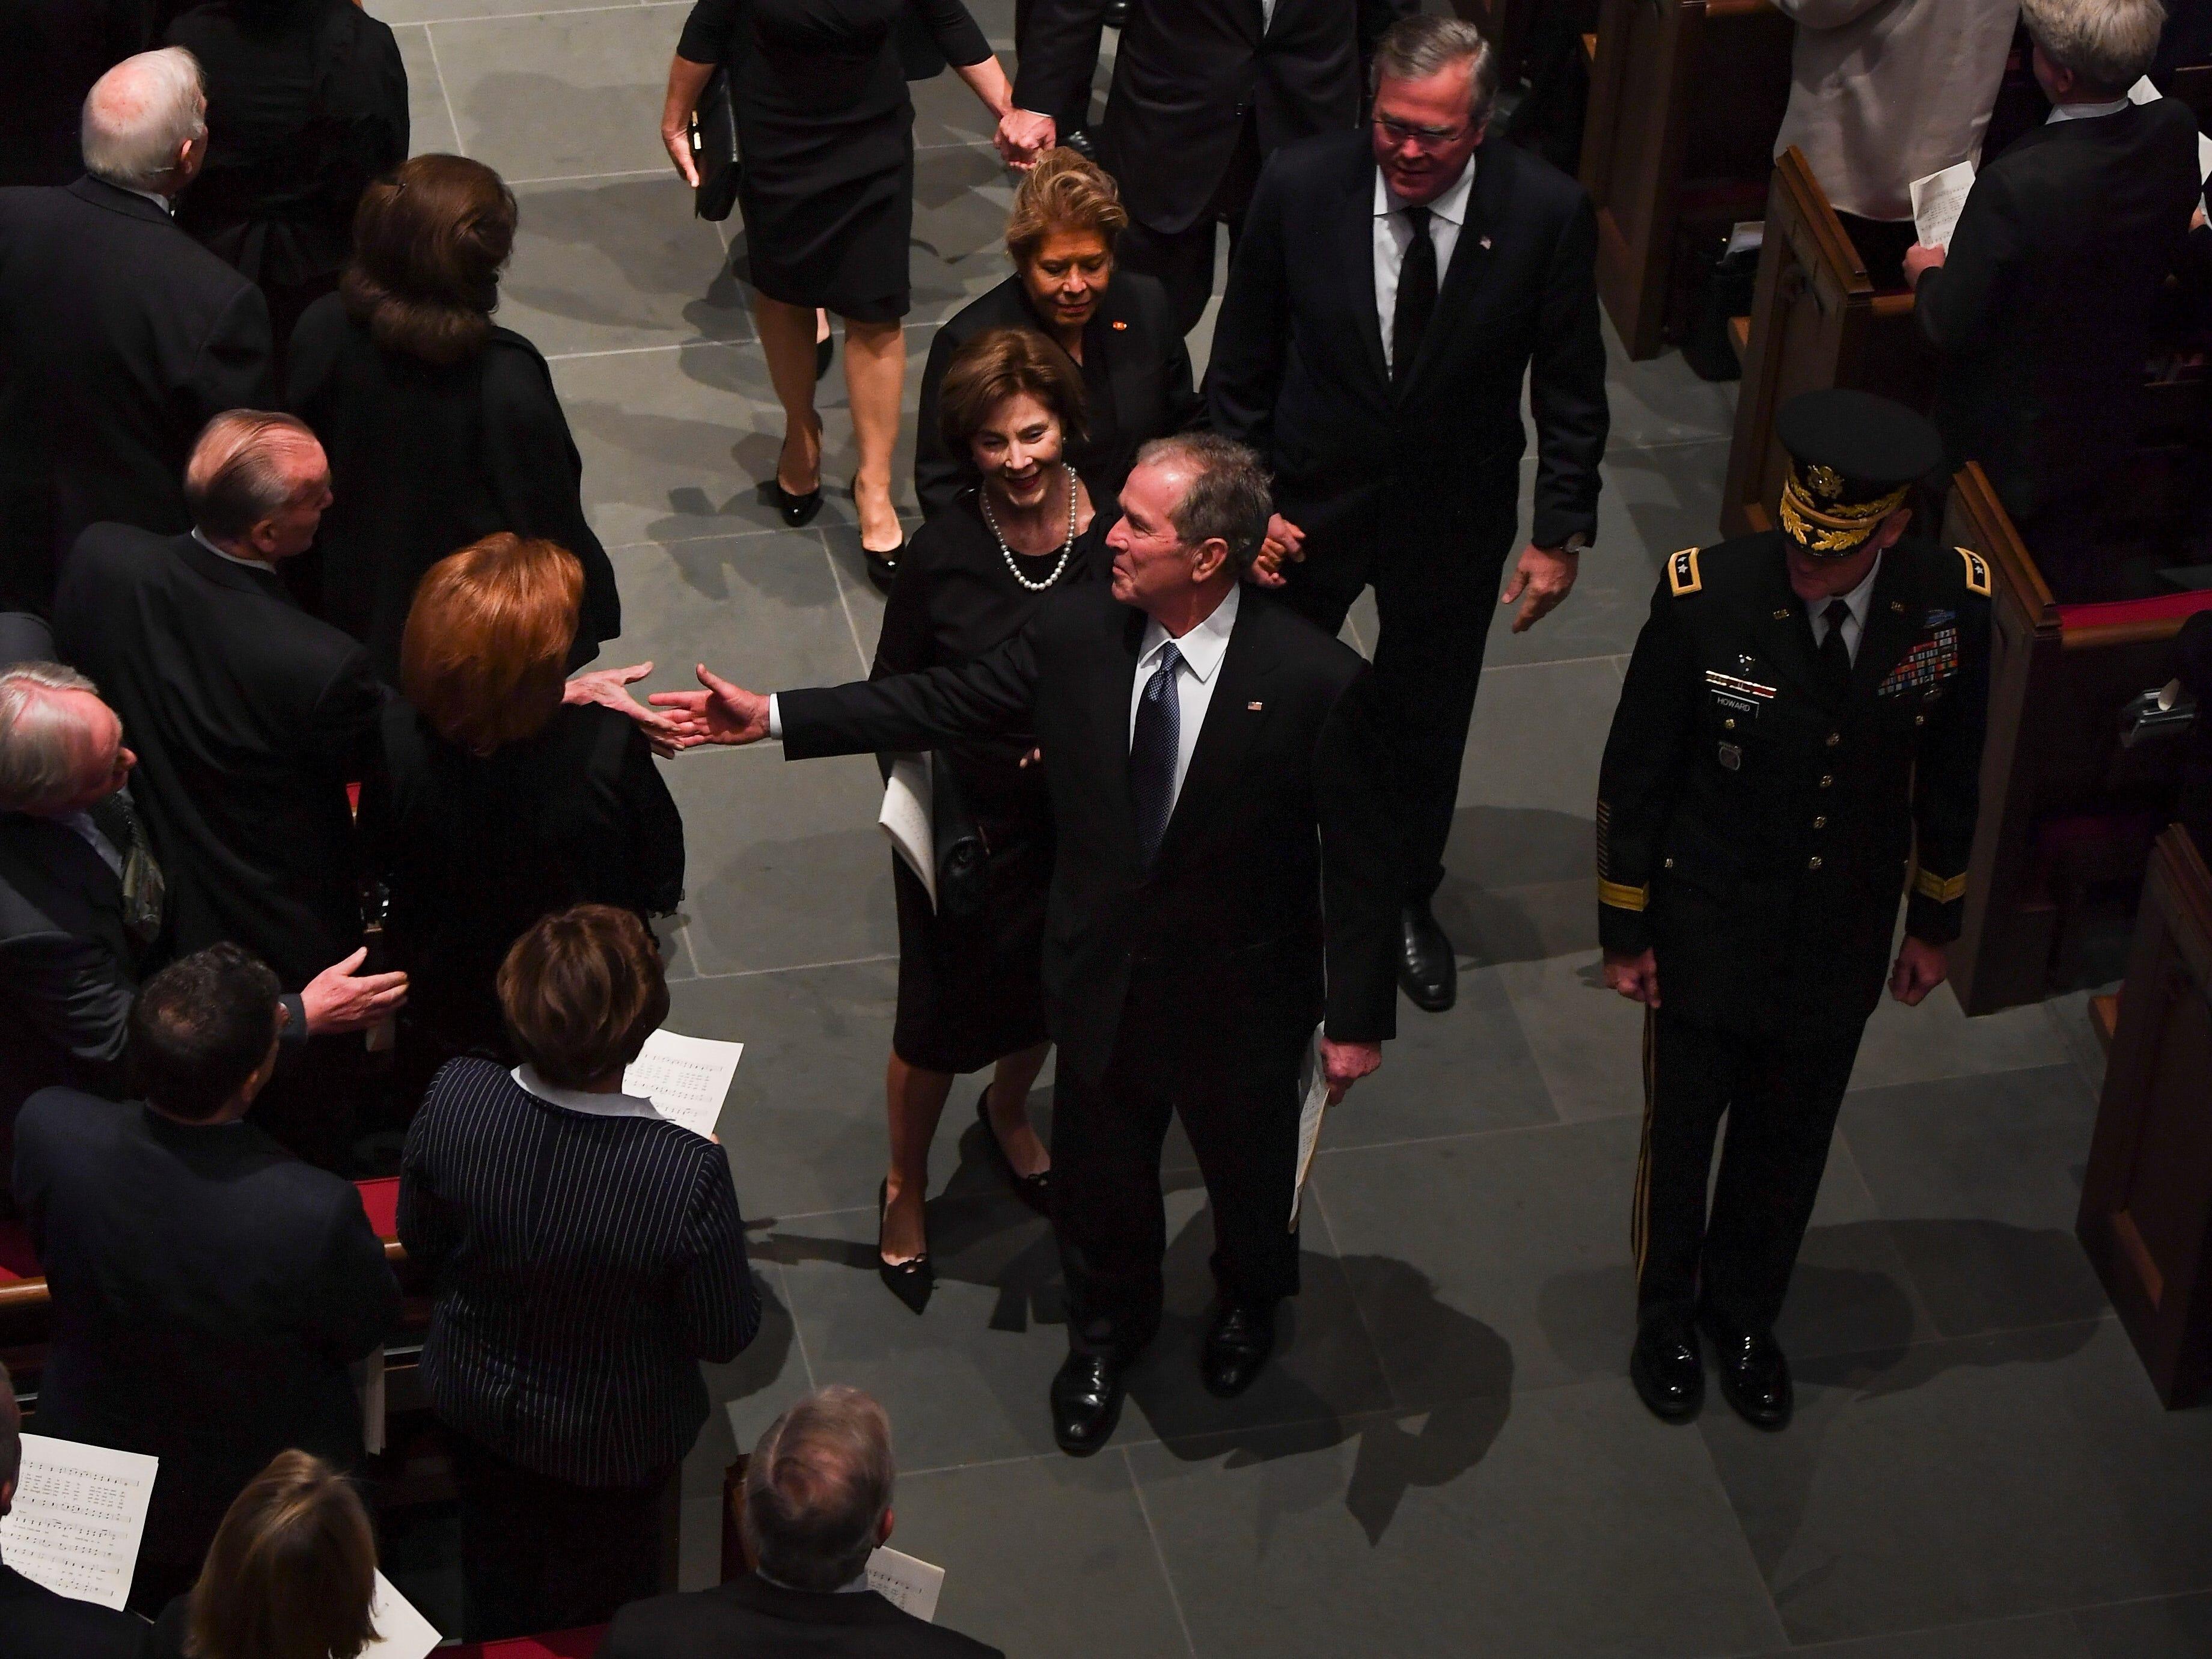 Former President George W. Bush and family depart the funeral service for former President George H.W. Bush at St. Martin's Episcopal Church in Houston, Thursday, Dec. 6, 2018.